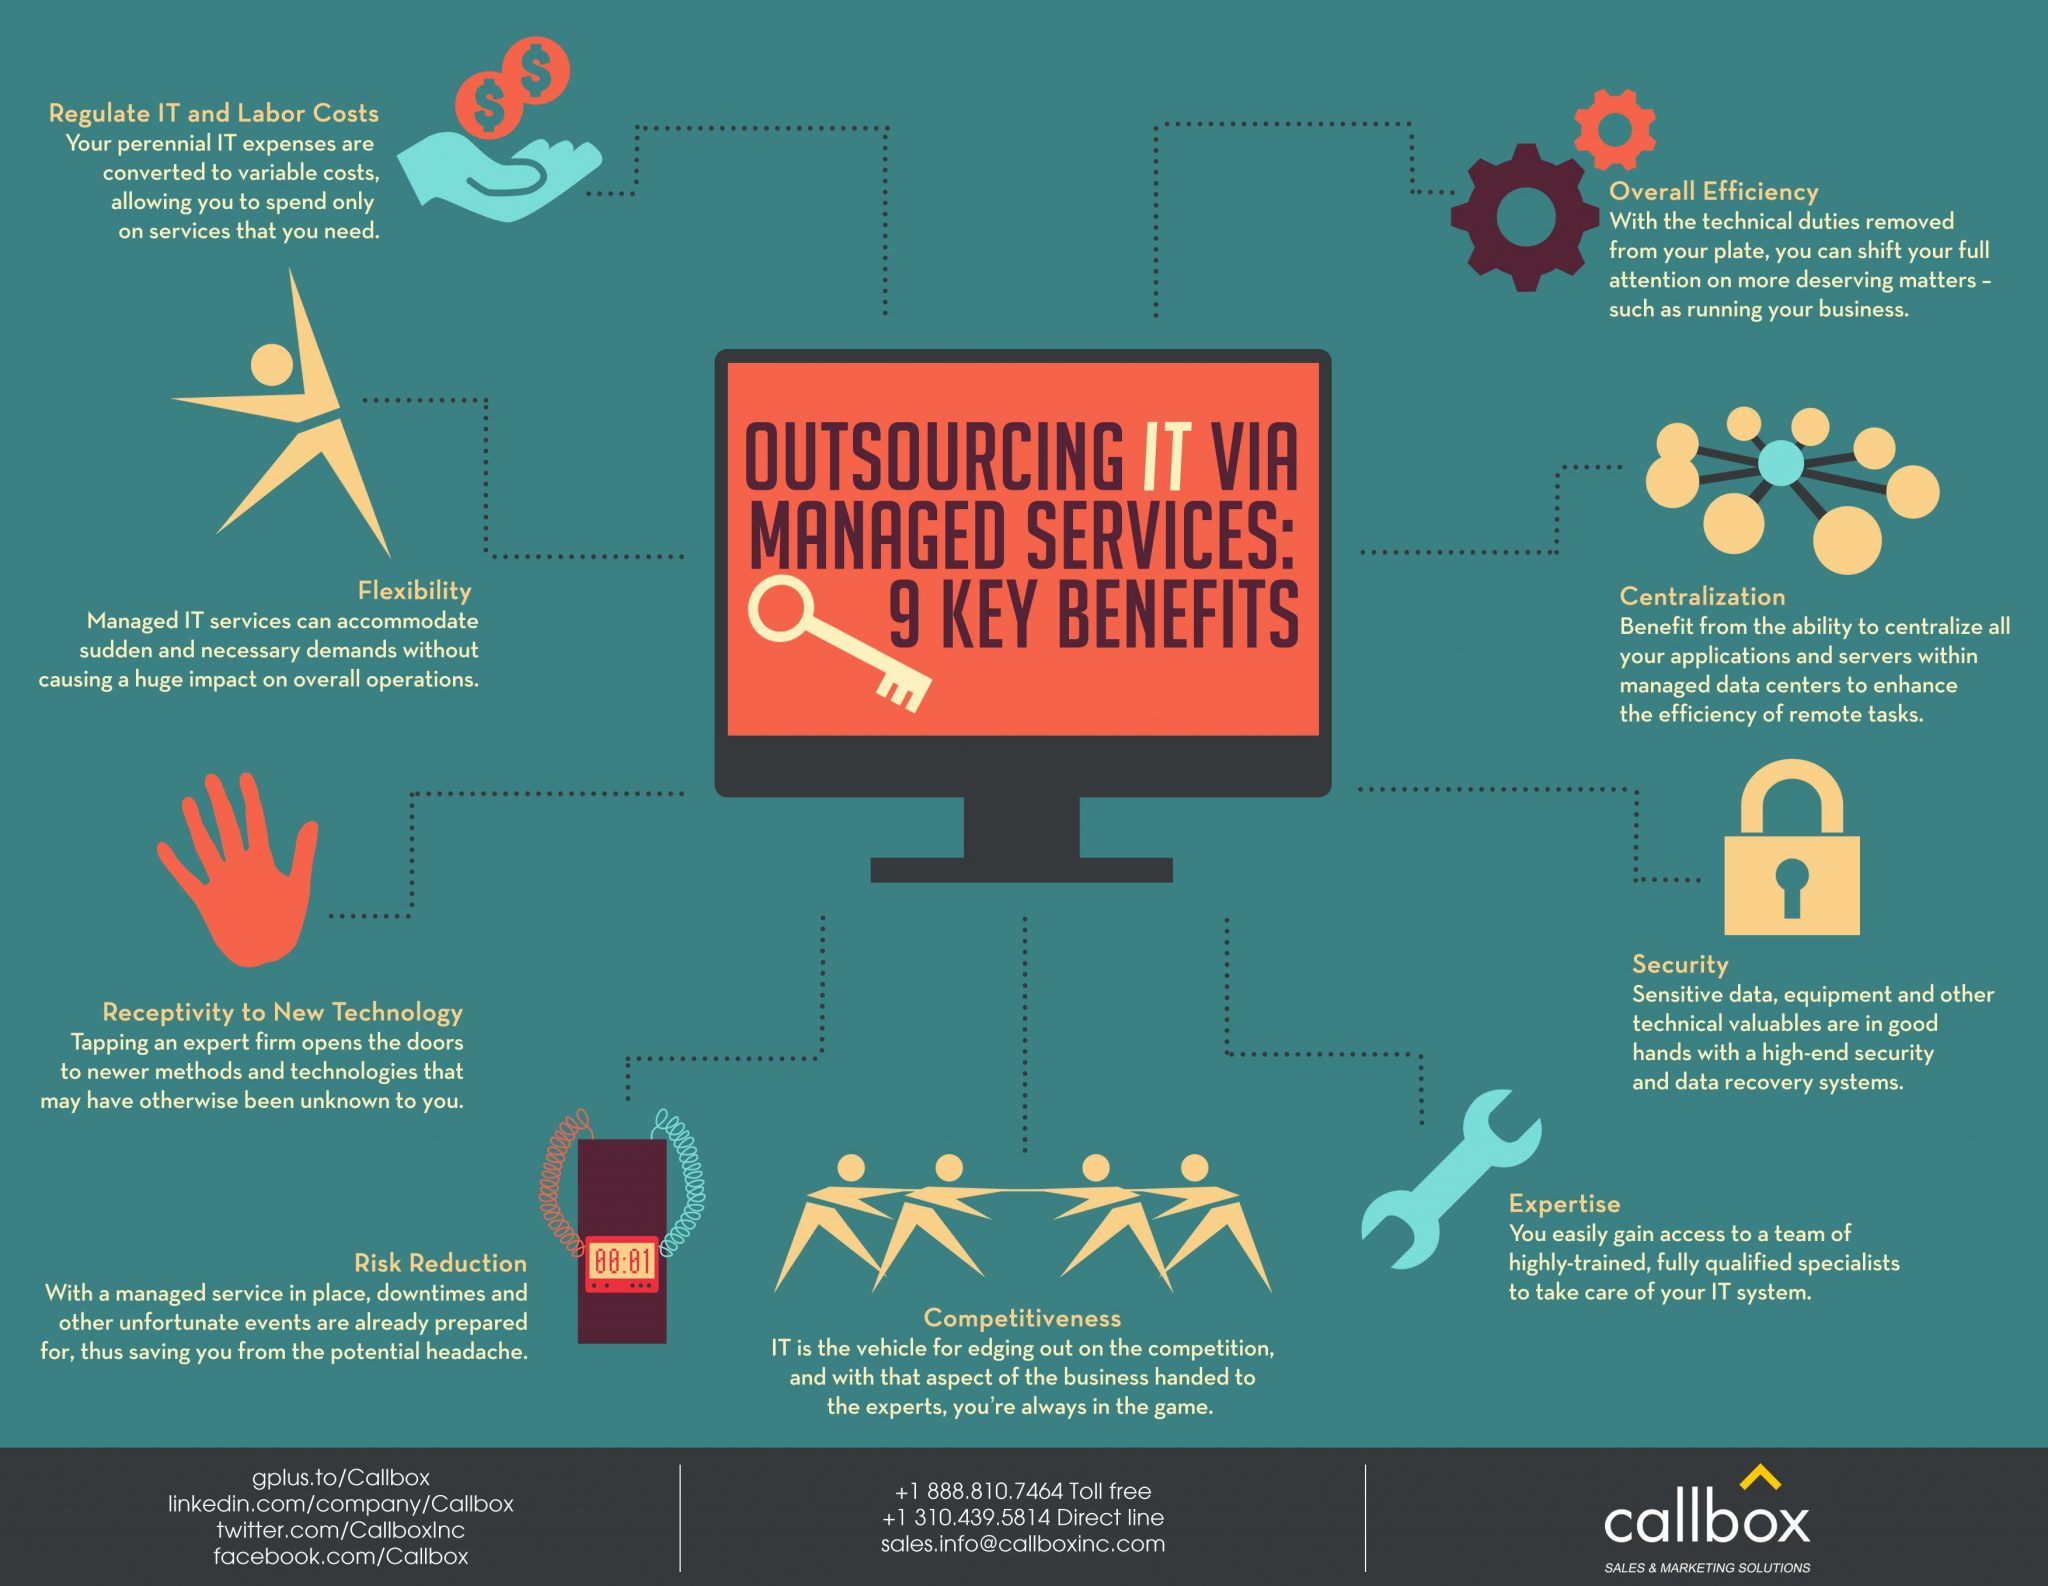 Outsourcing IT usluga IT usluge Online marketing izrada web stranice izrada web stranice za tvrtku